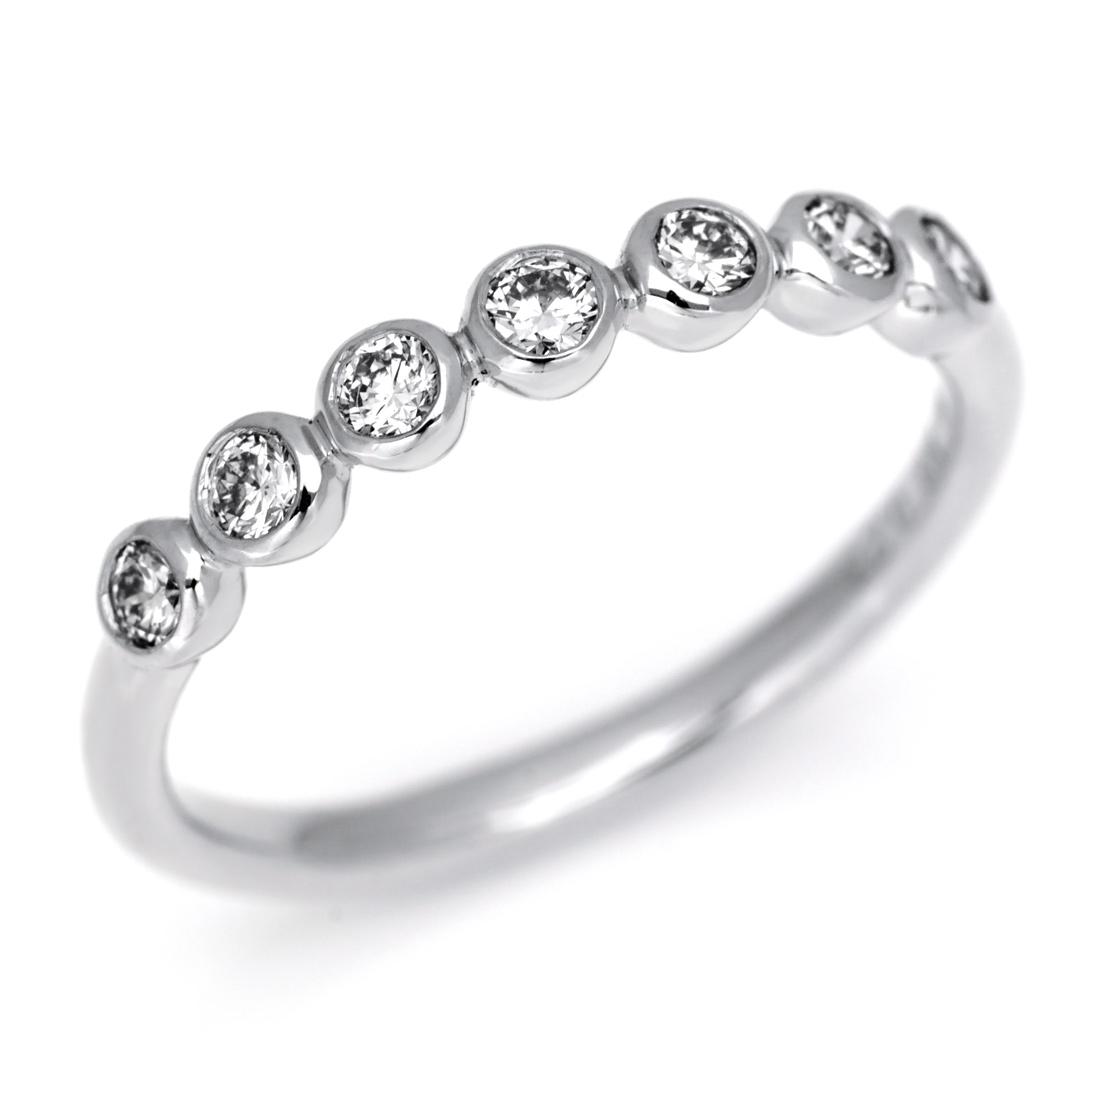 K18 ダイヤモンド リング 「ponte」 指輪 ダイアモンド ゴールド 18K 18金 誕生日 4月誕生石 刻印 文字入れ メッセージ ギフト 贈り物 ピンキーリング対応可能